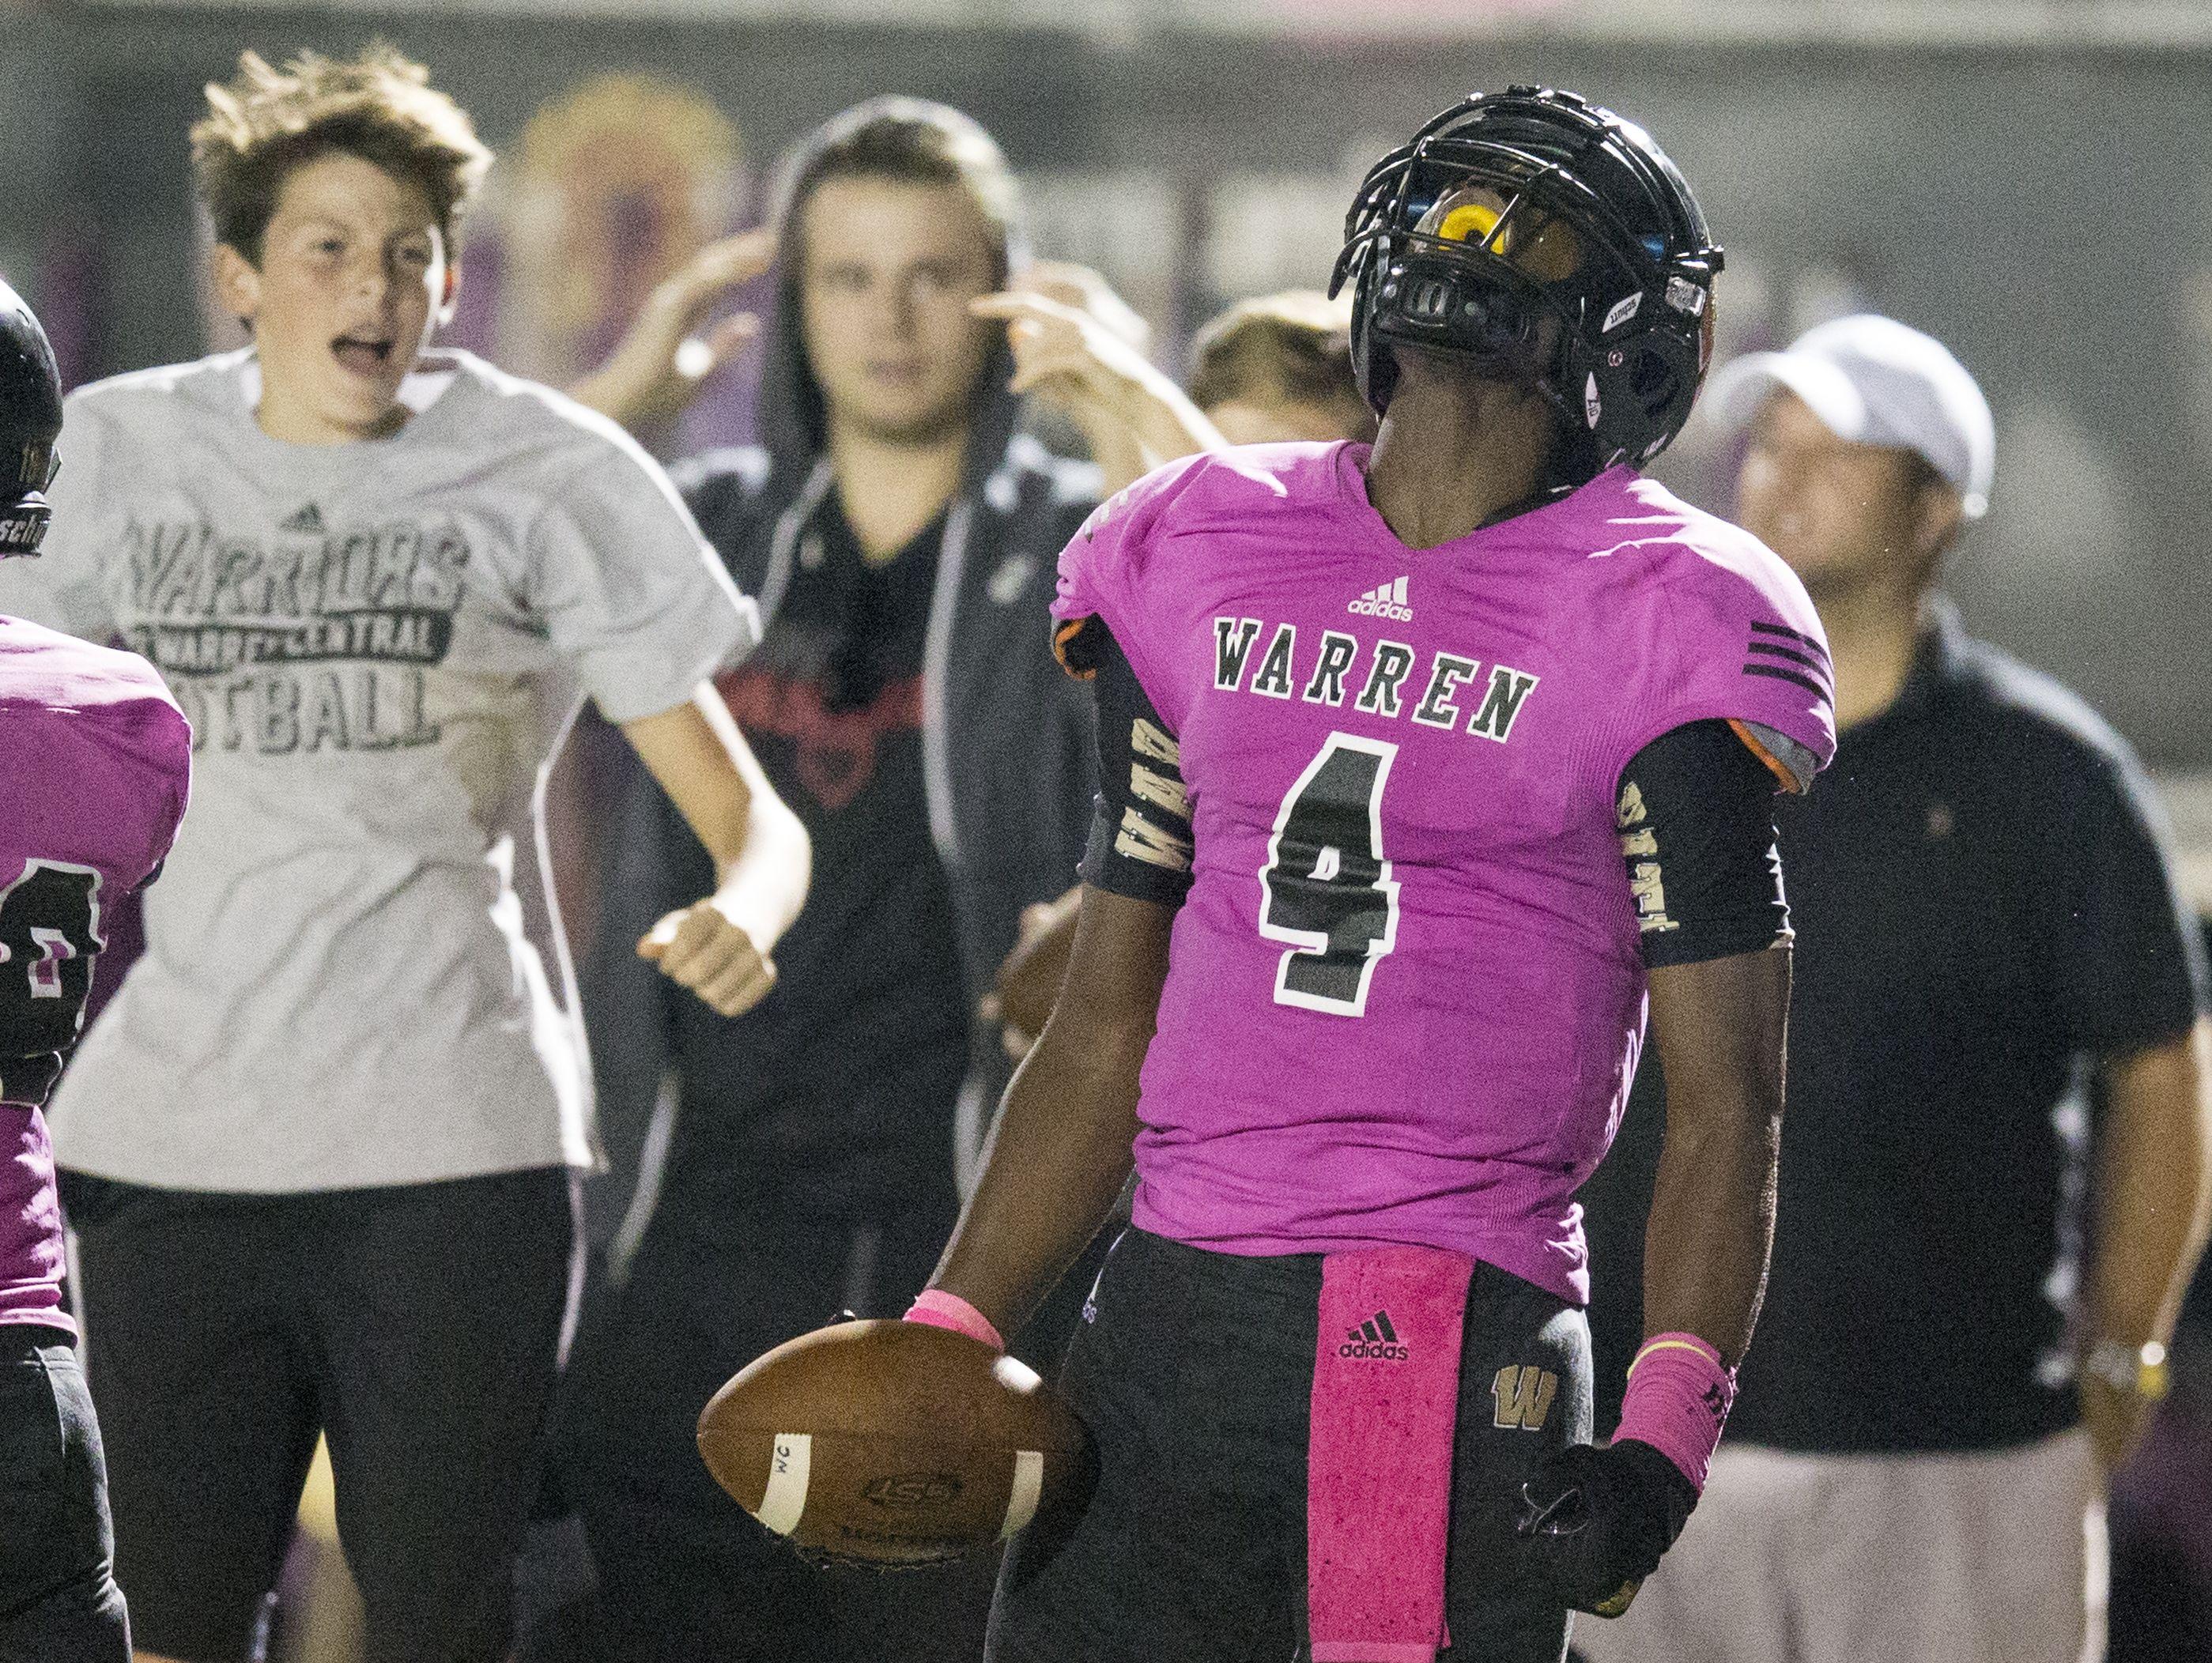 David Bell celebrates the game winning score he just made for Warren Central High School, Ben Davis at Warren Central High School football, Indianapolis, Friday, Sept. 16, 2016. WCHS won 35-34.